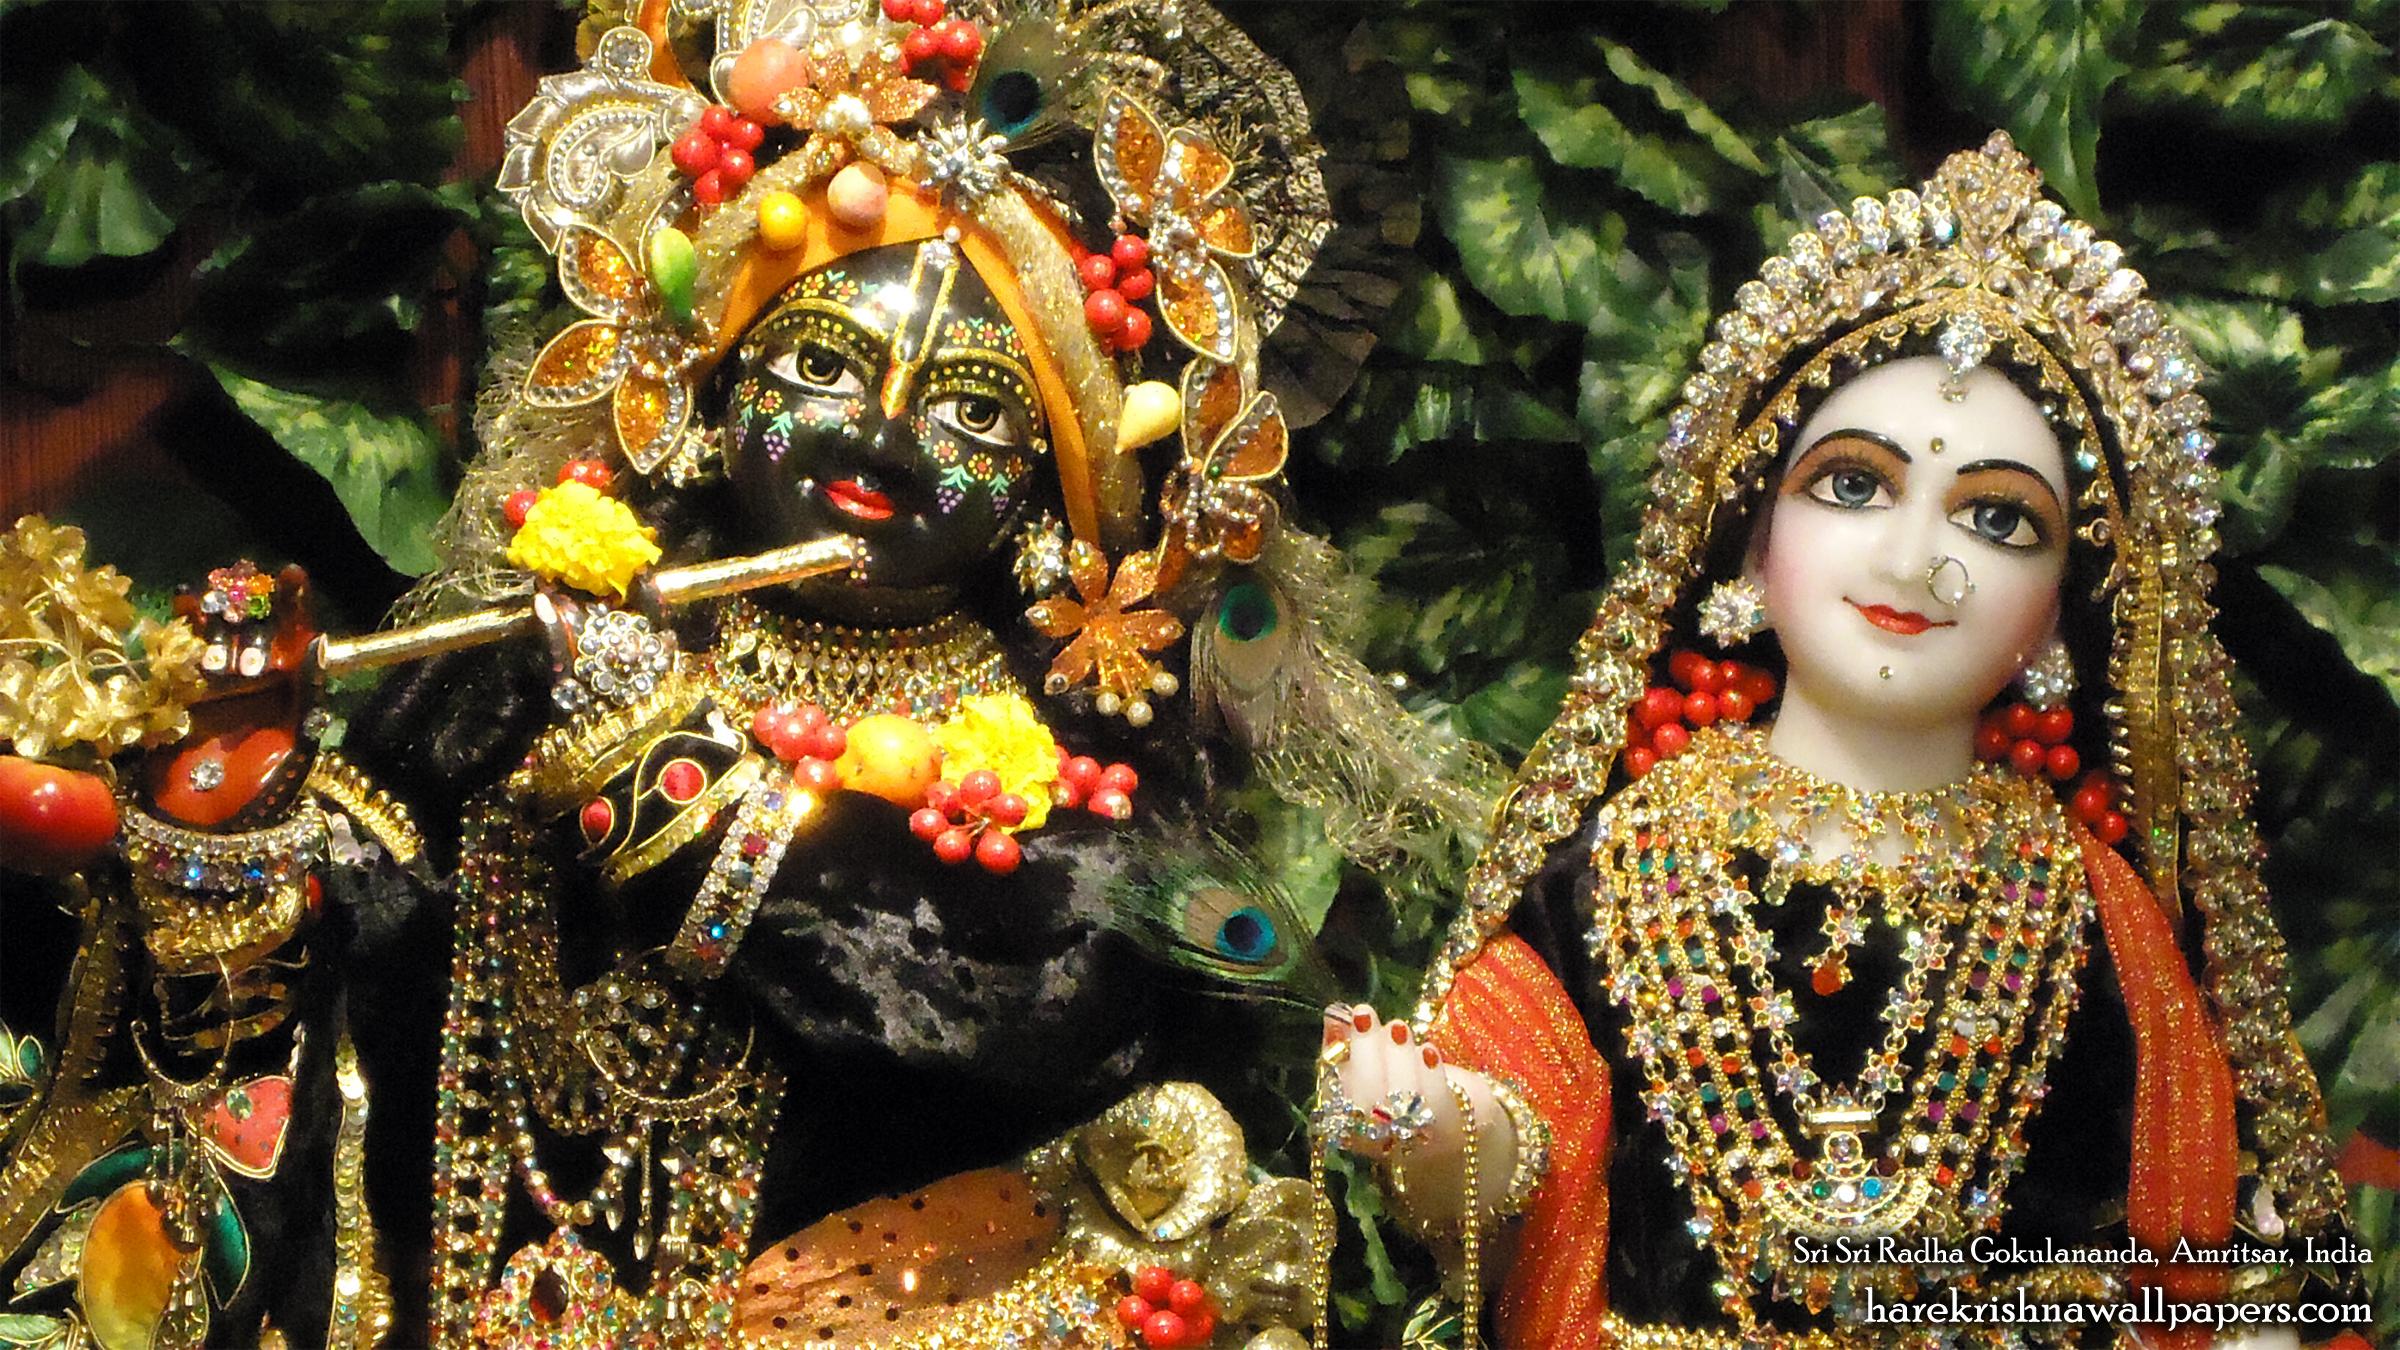 Sri Sri Radha Gokulananda Close up Wallpaper (004) Size 2400x1350 Download